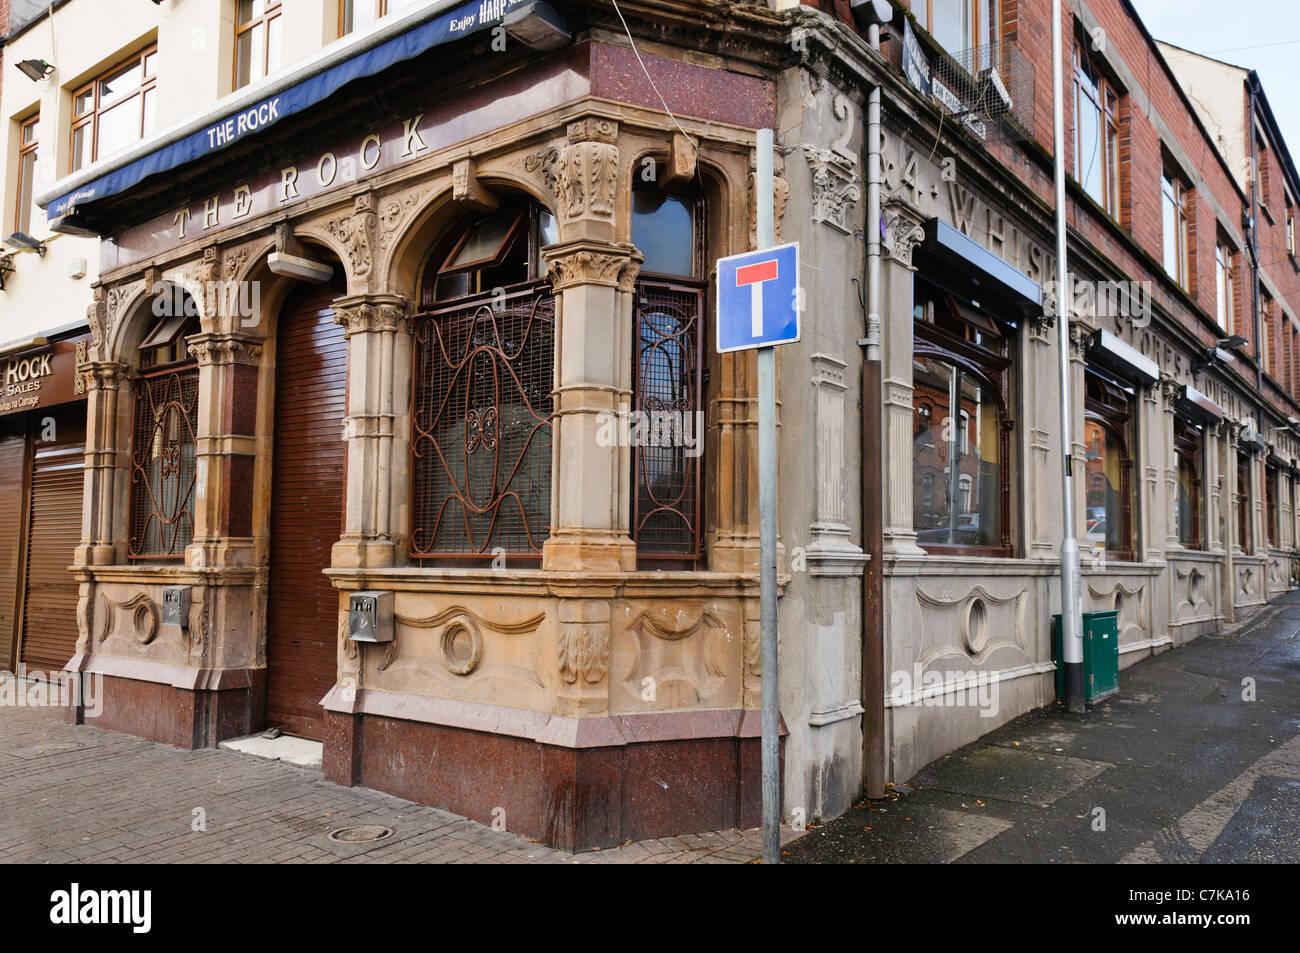 The Rock Bar, Falls Road, Belfast - Stock Image